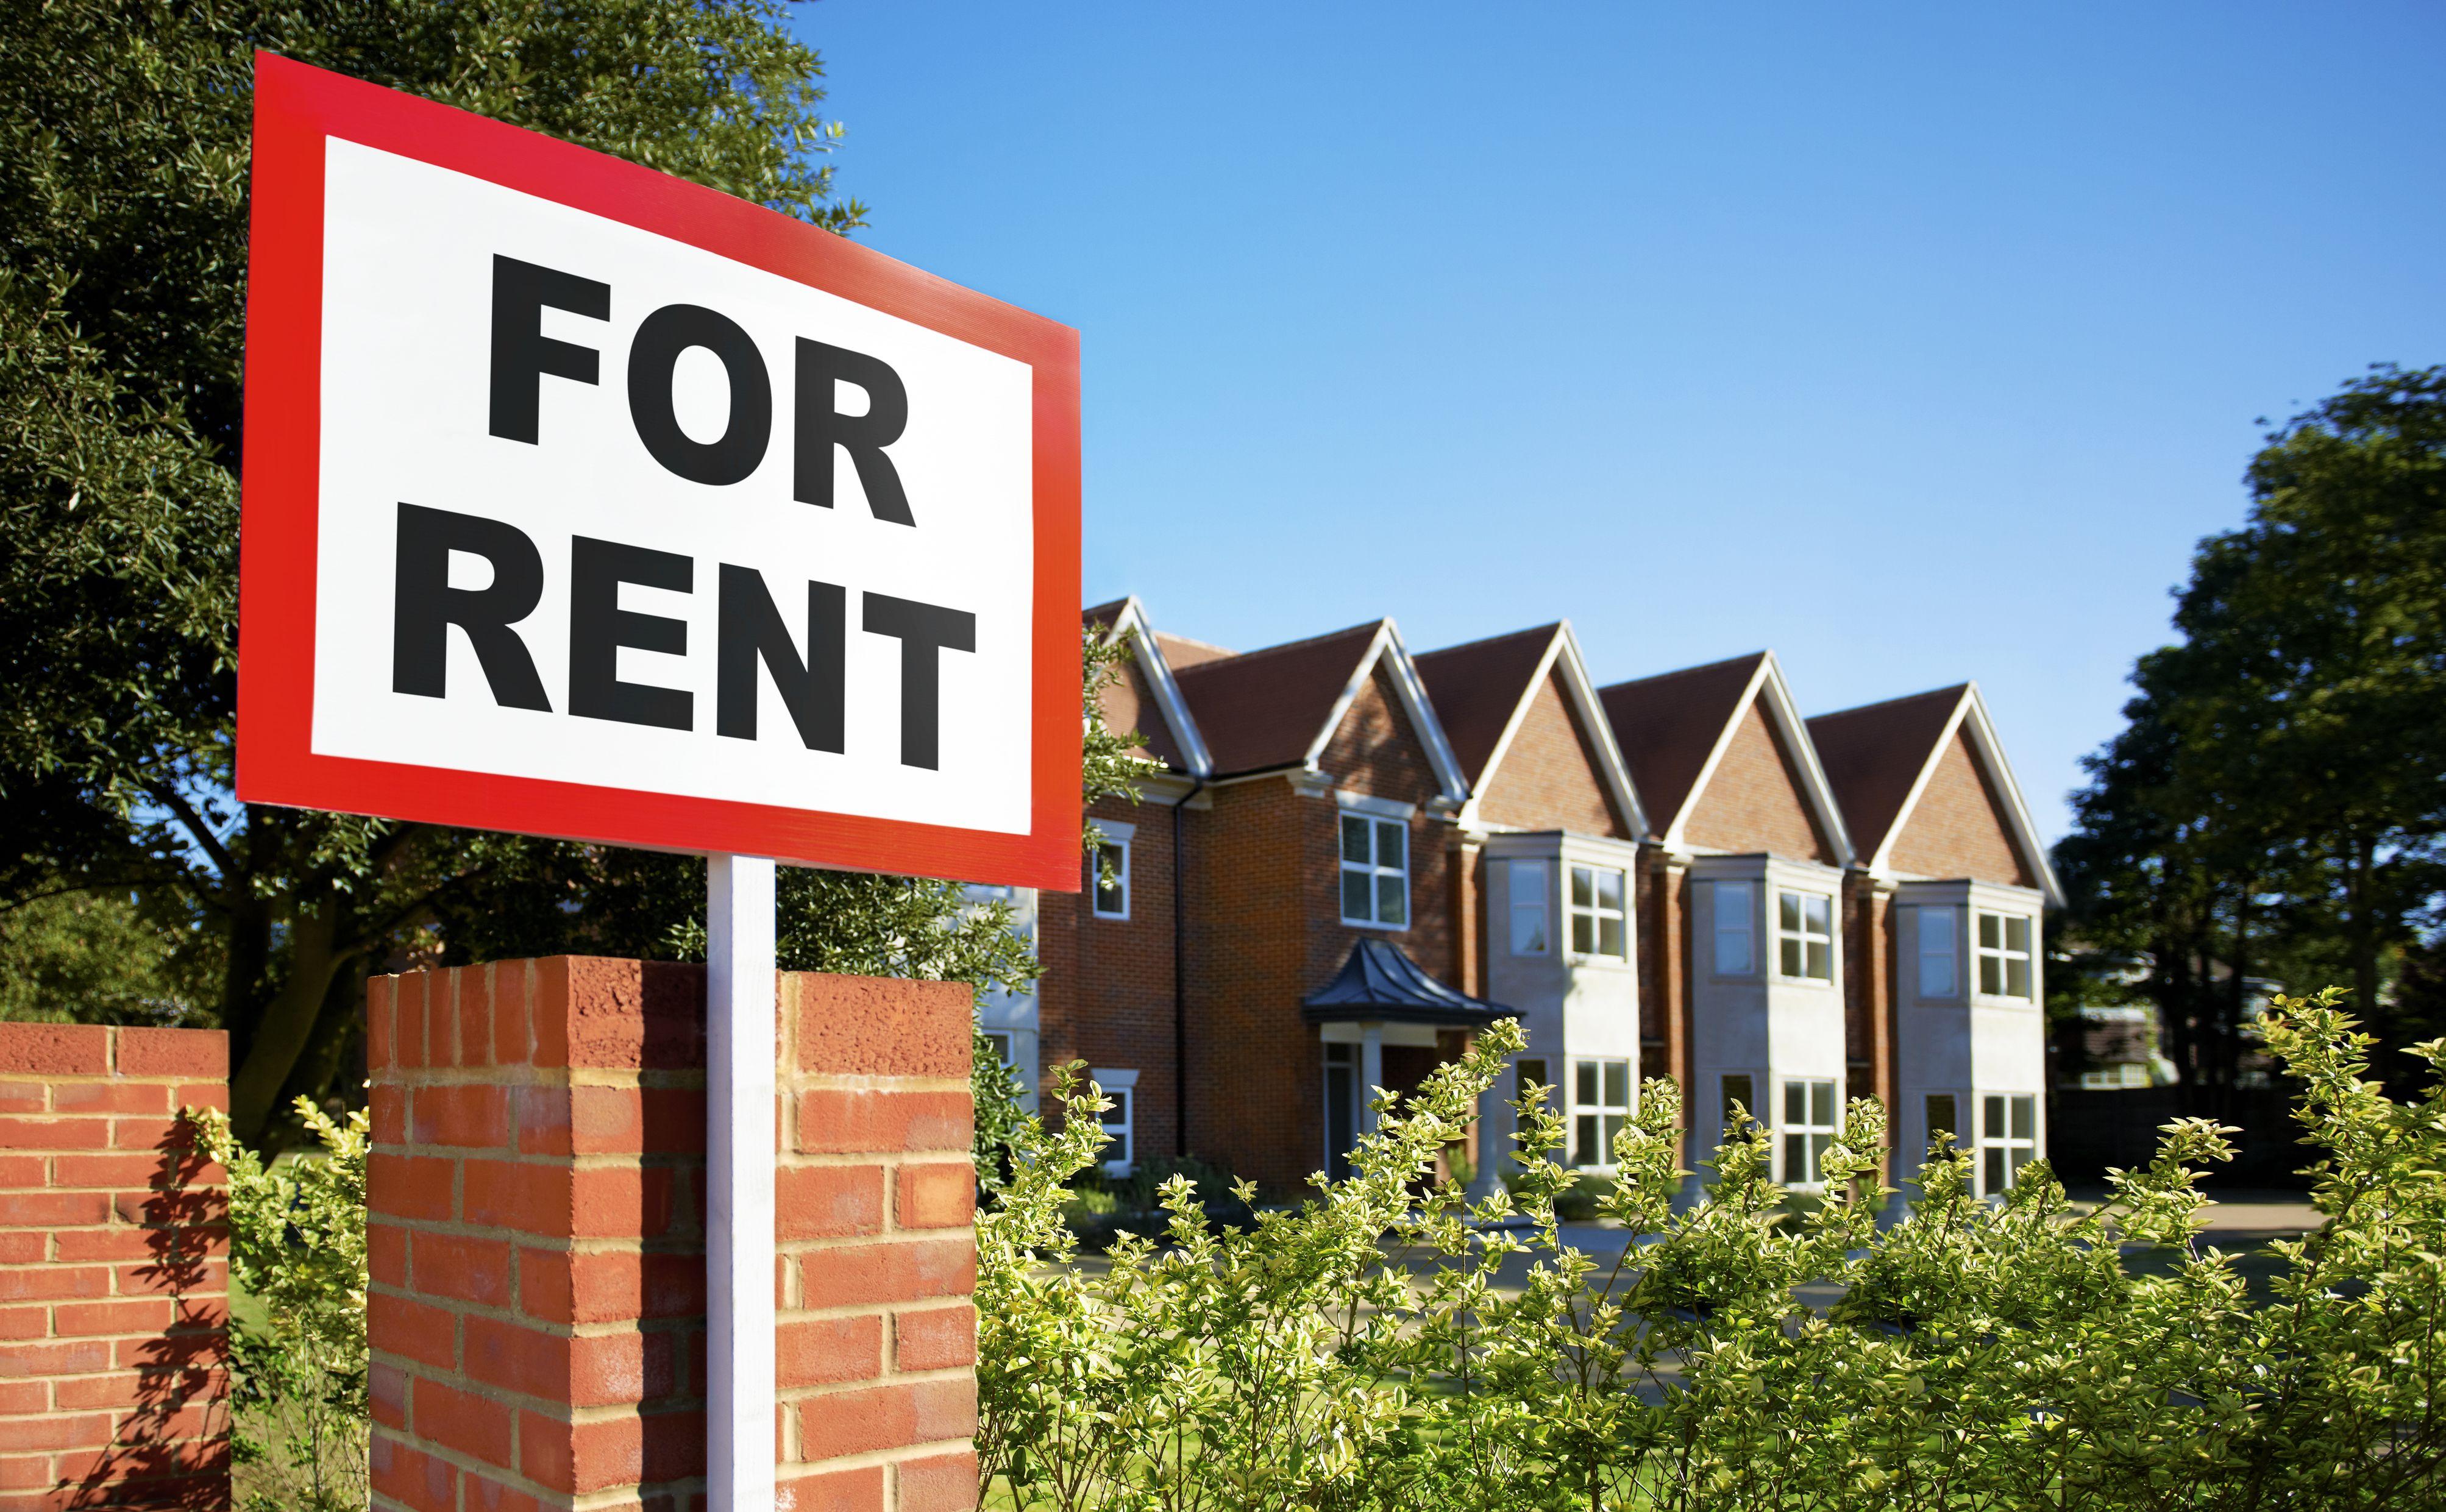 Image result for flat rent image